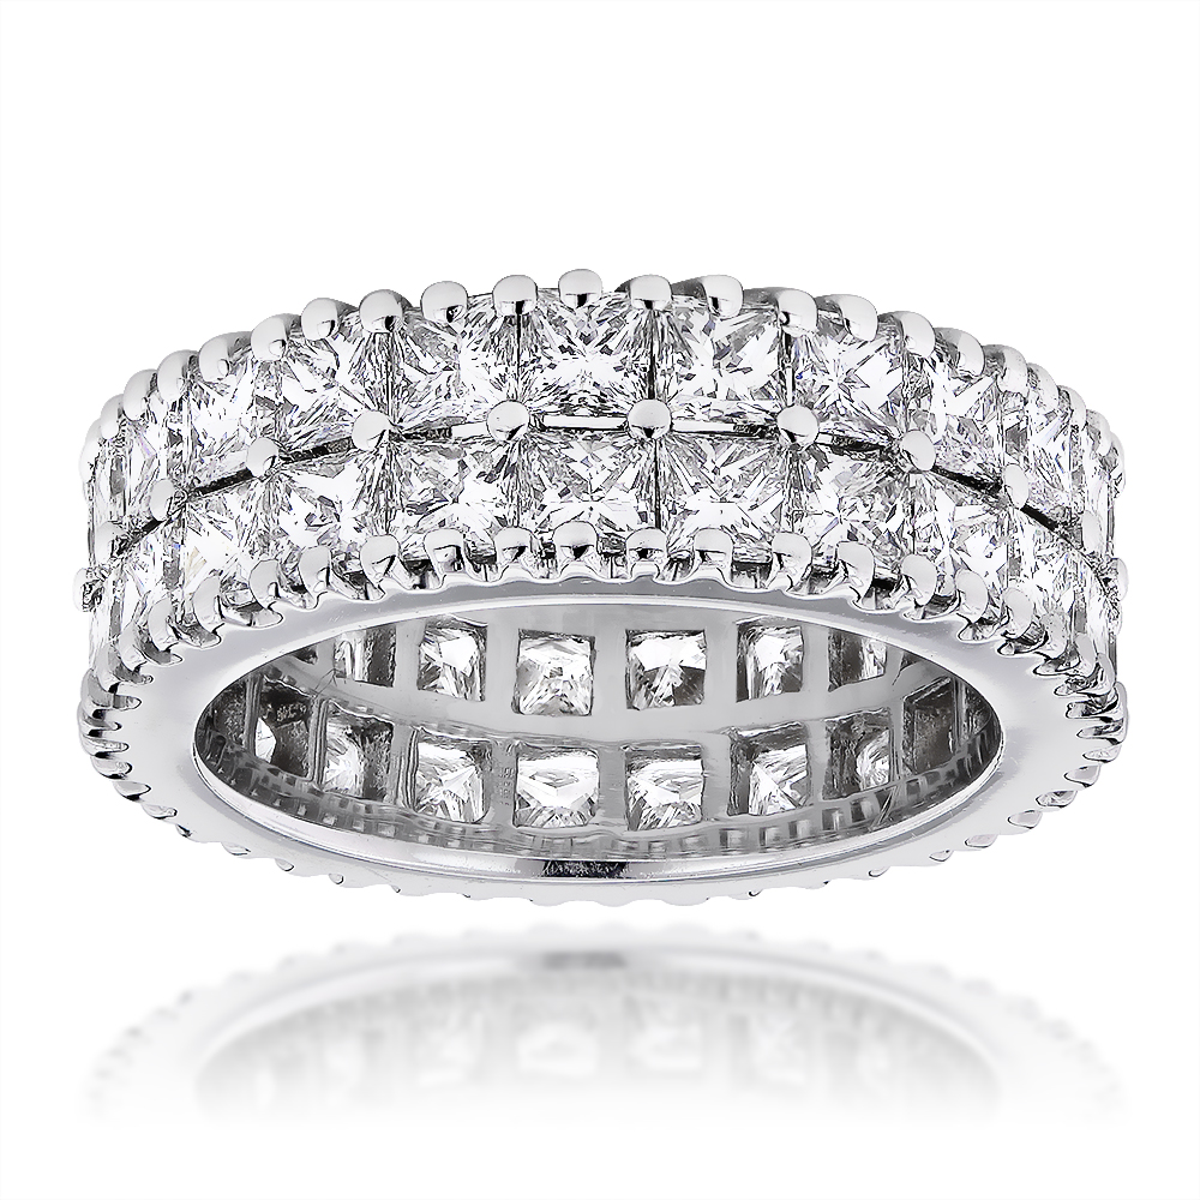 18K Gold Princess Cut Diamond Eternity Band Anniversary Ring 6.52ct VS